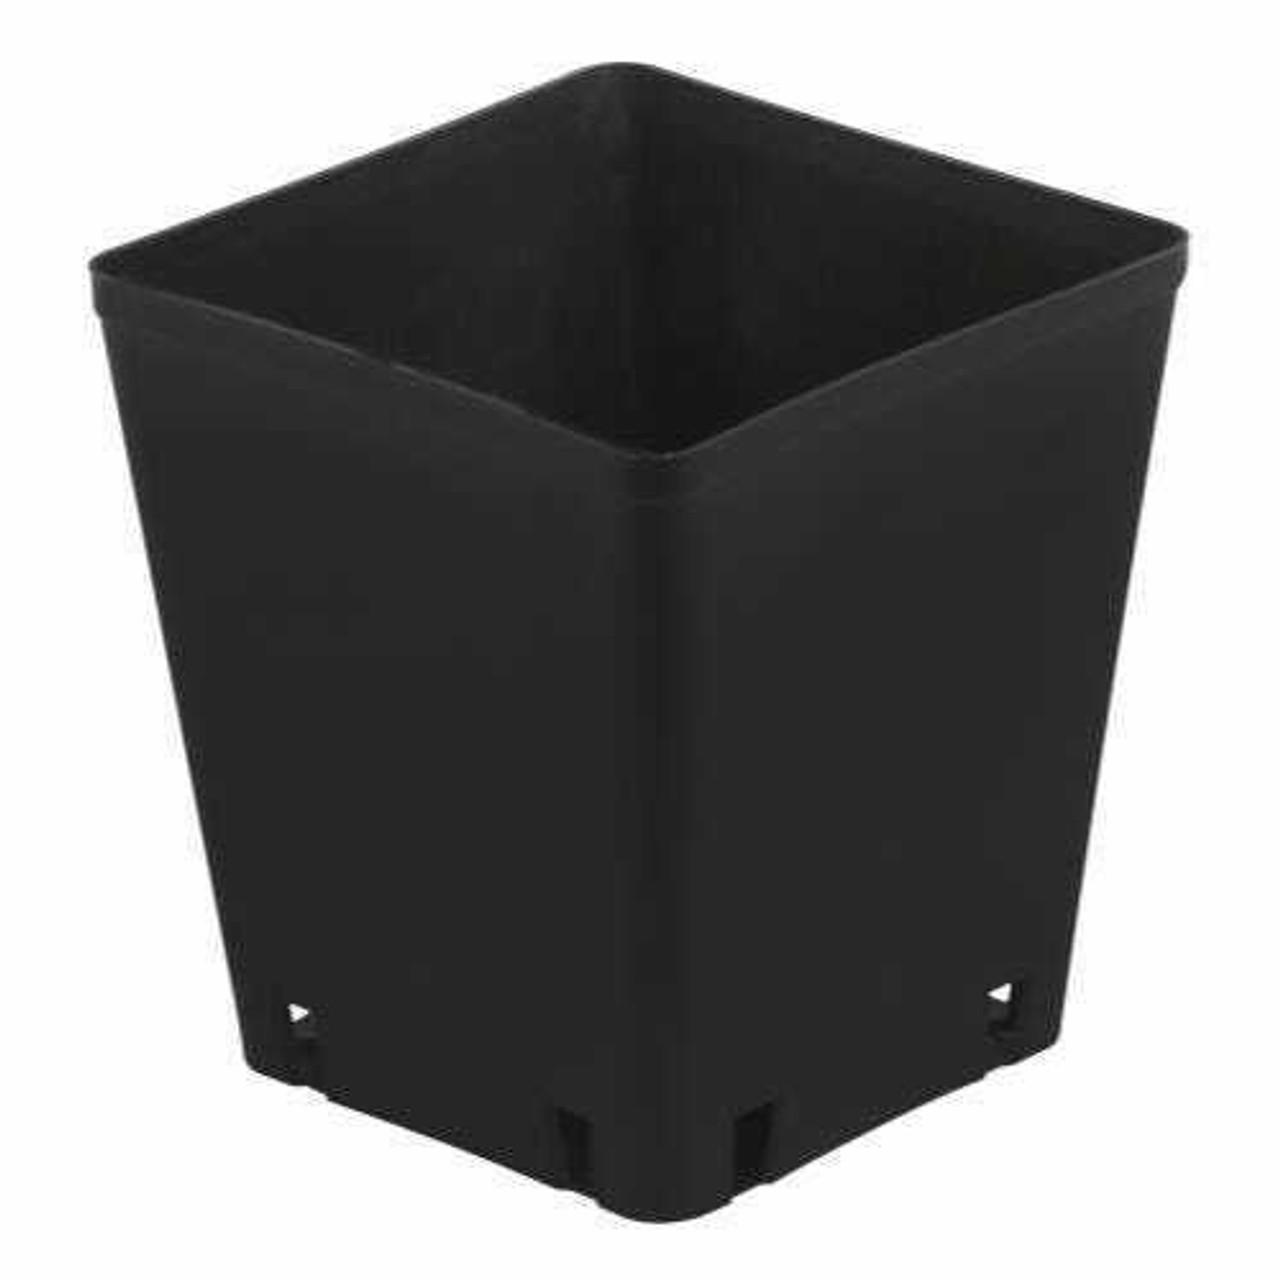 Gro Pro Black Plastic Square Pot 5 x 5 x 5.25 in - 1